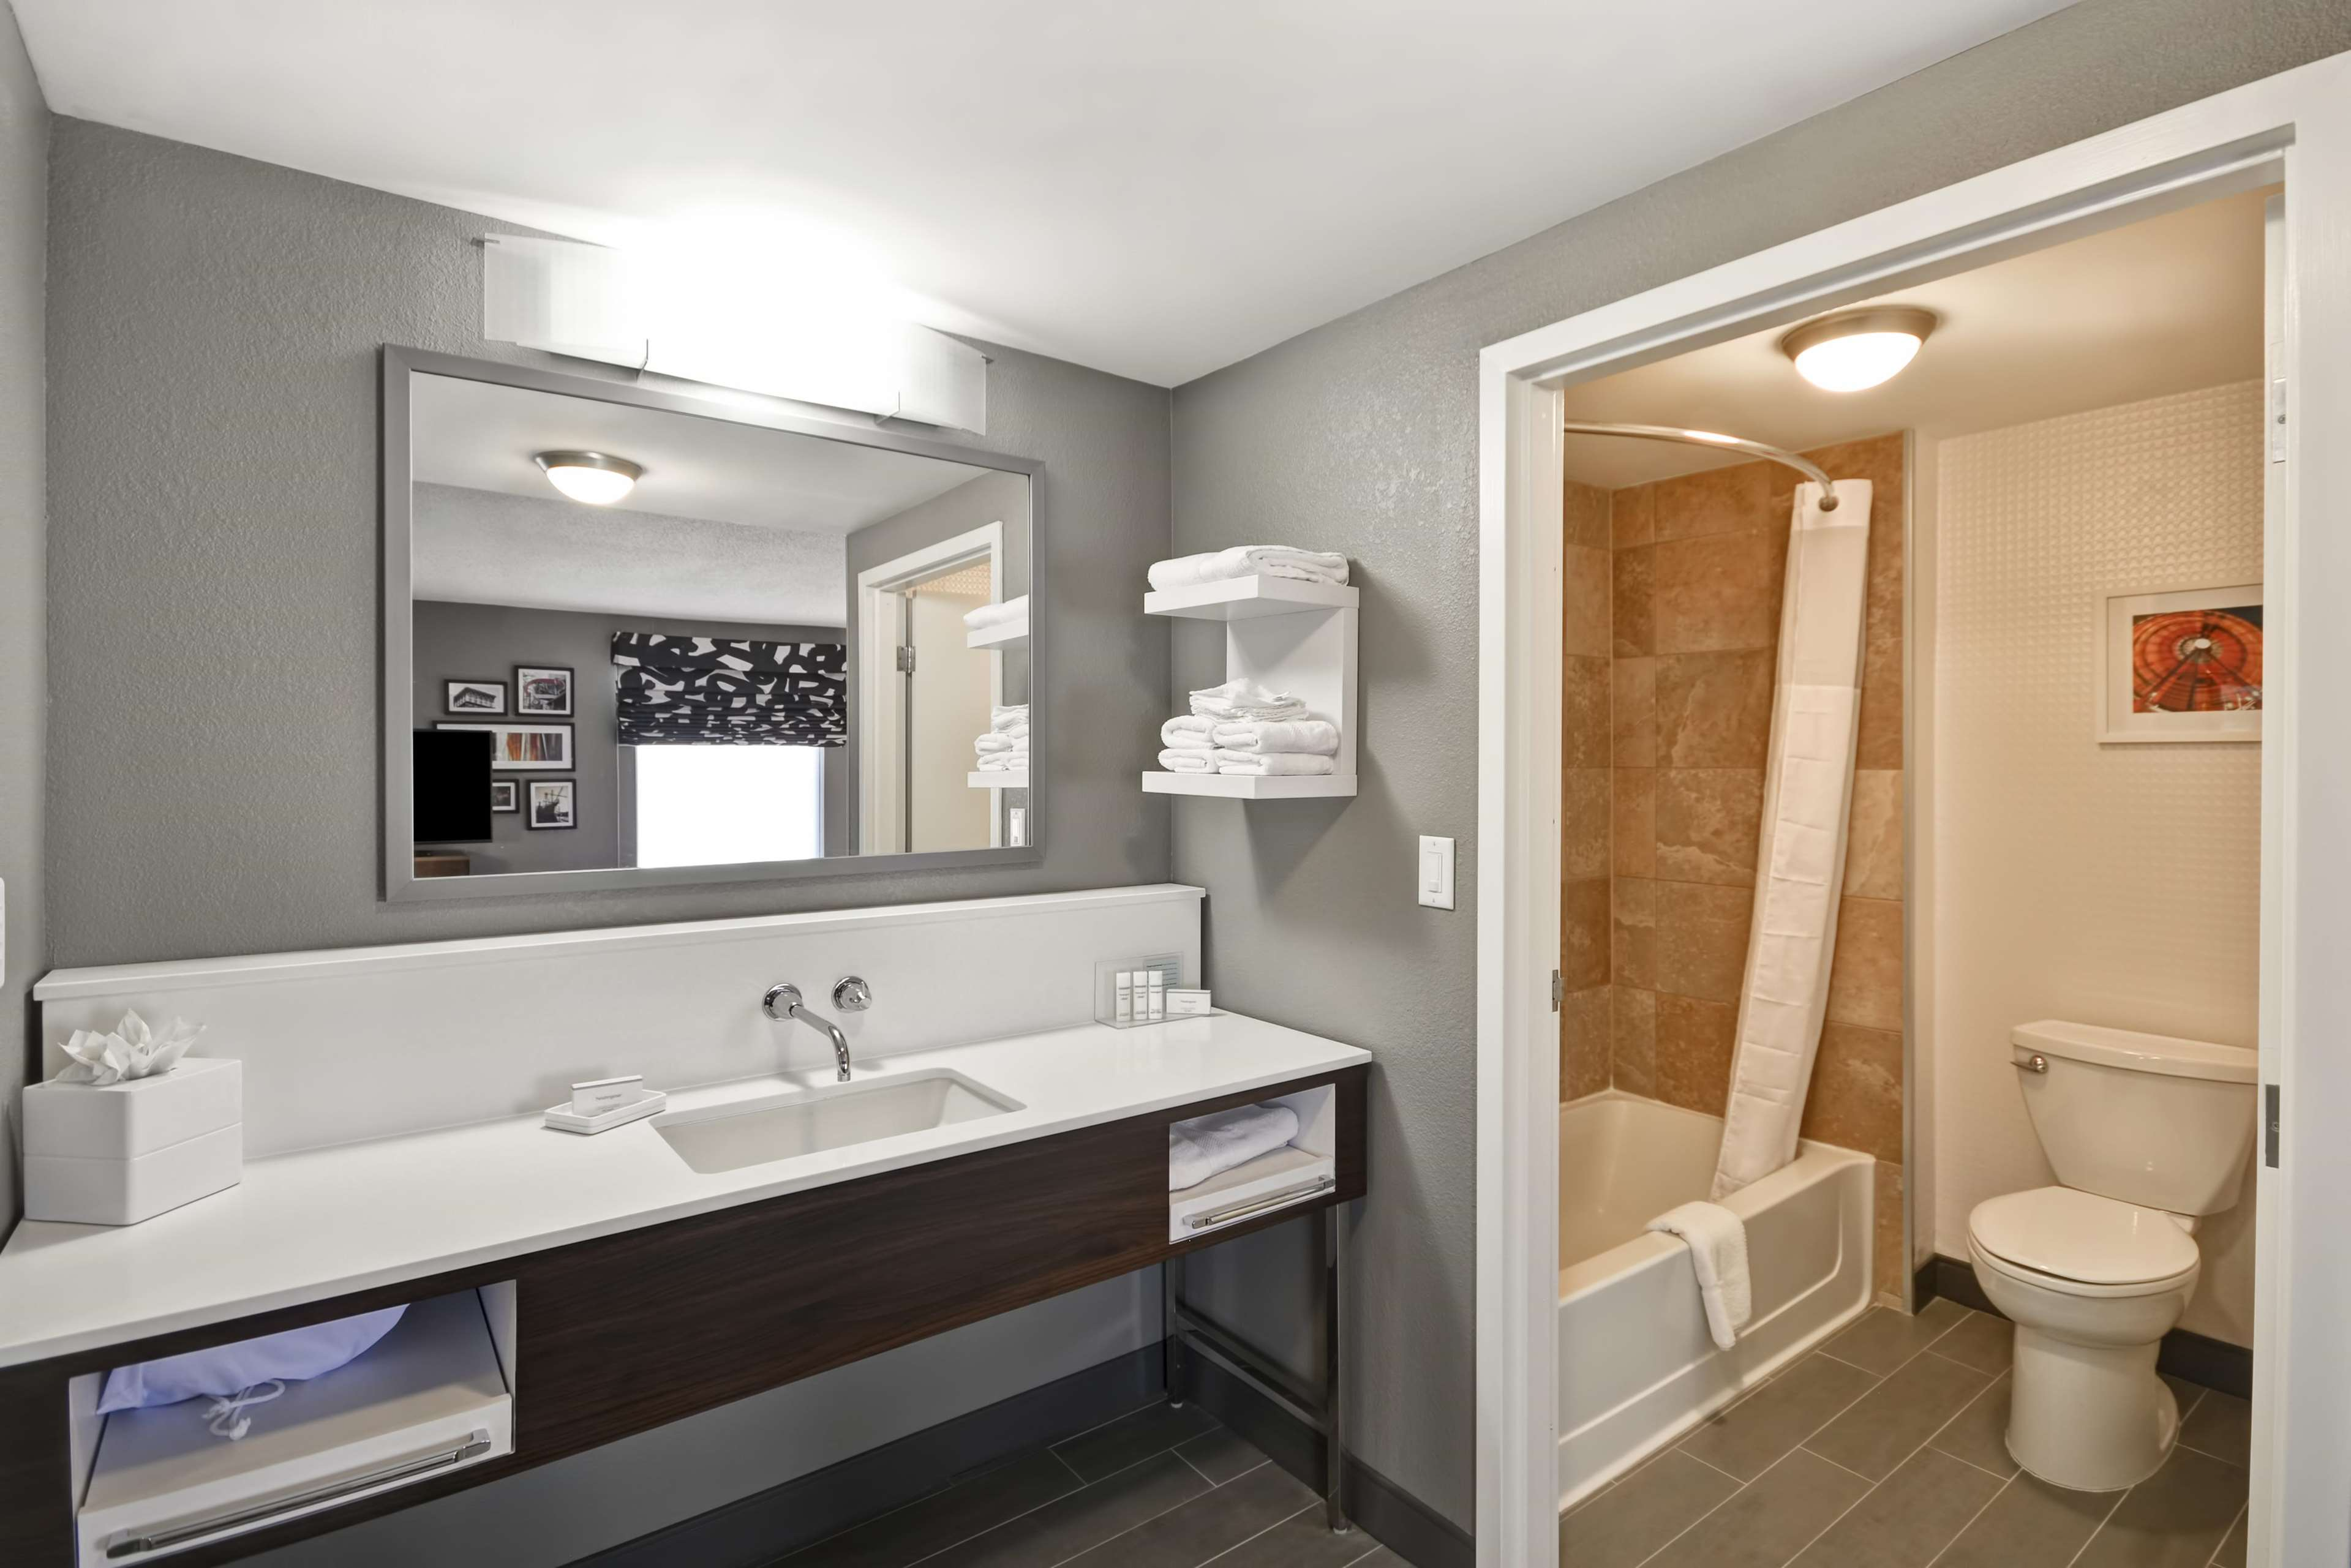 Hampton Inn & Suites Columbus-Easton Area image 48